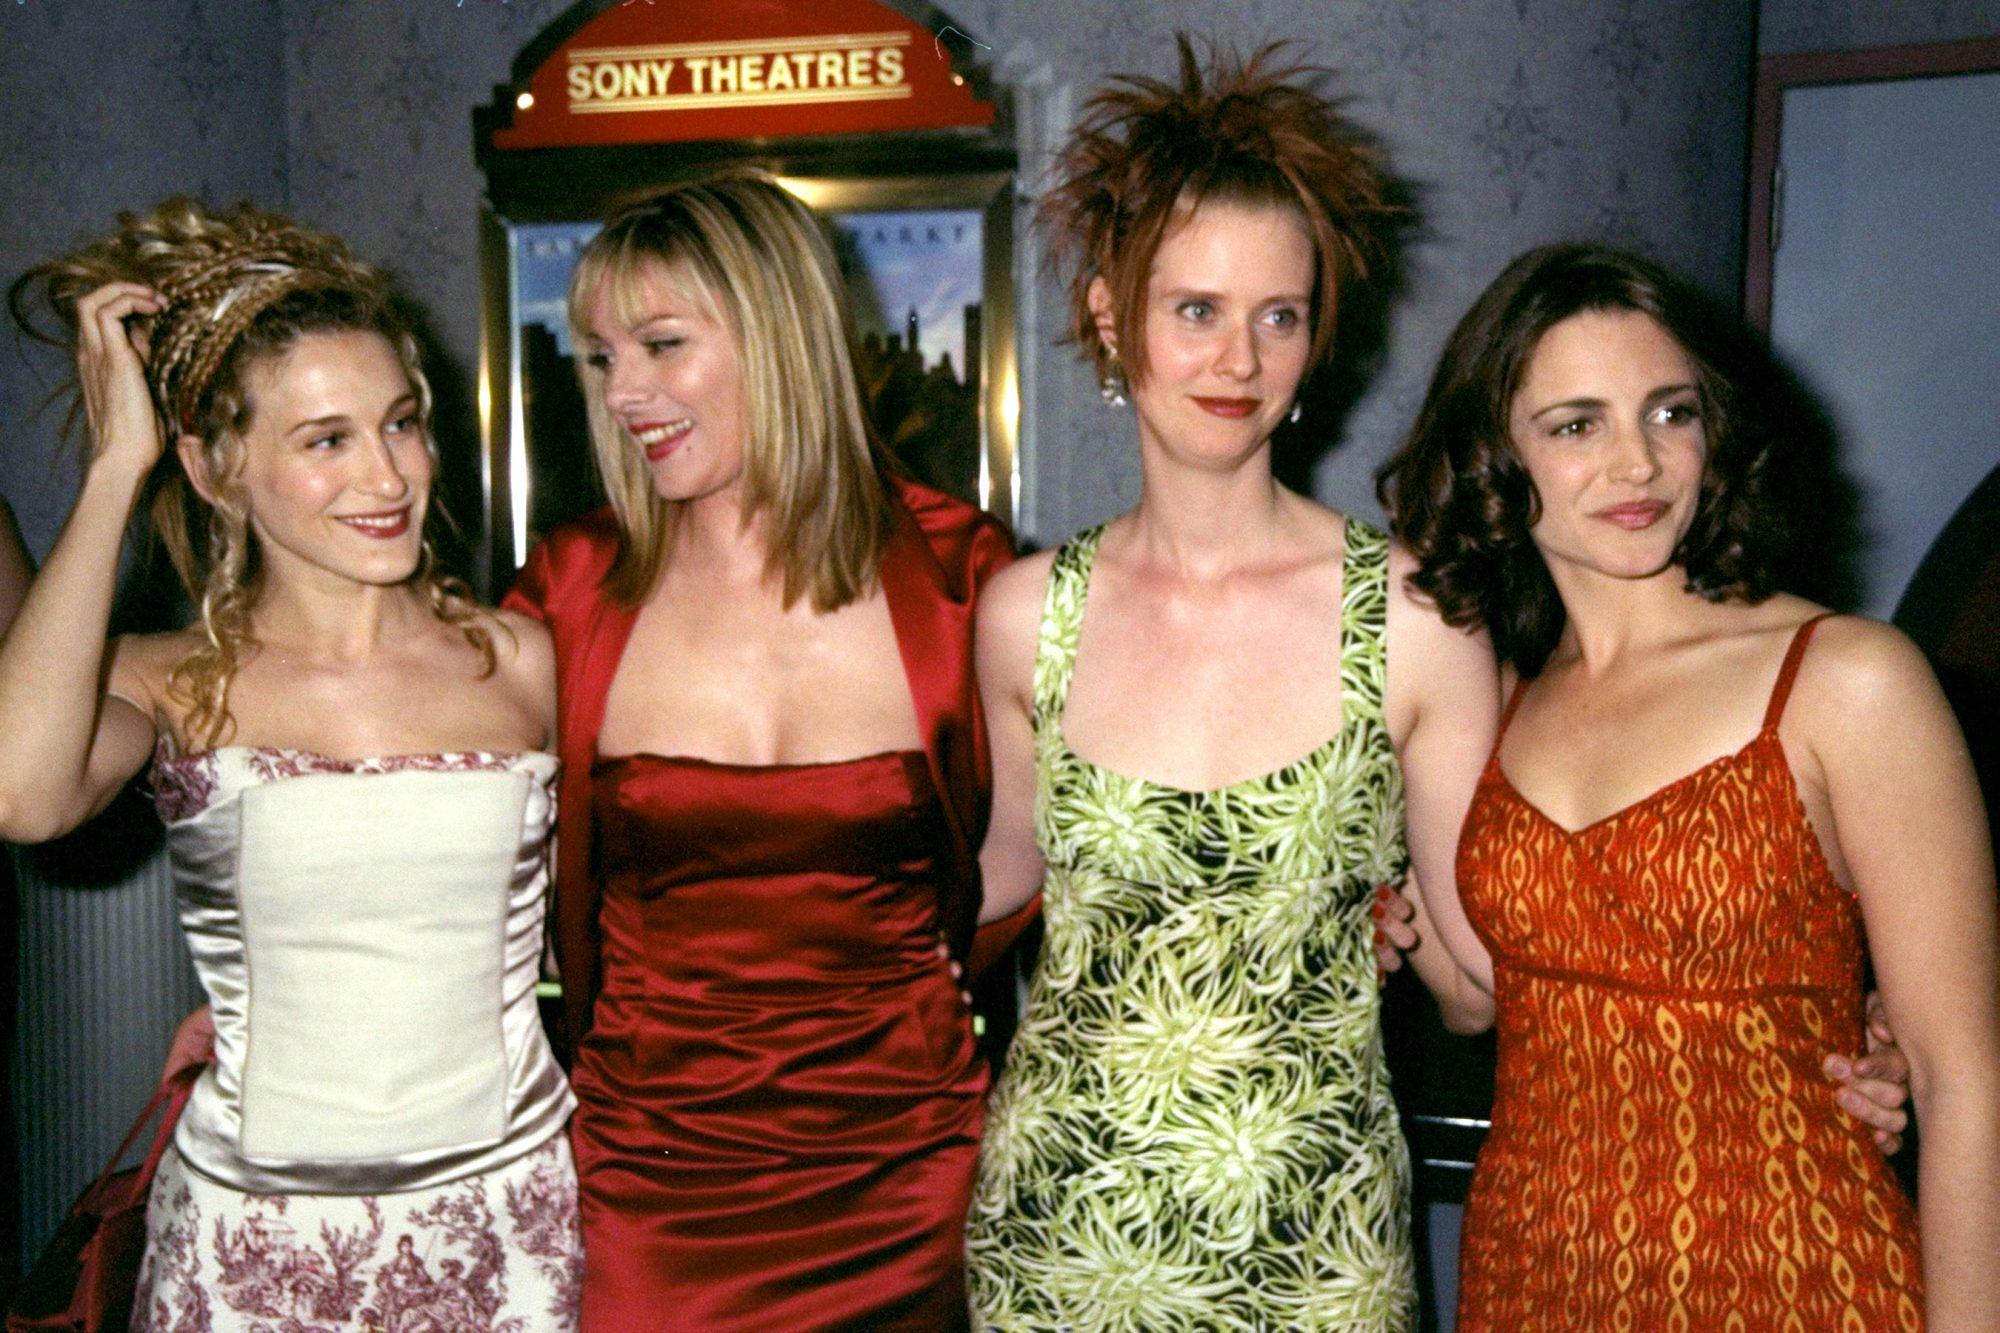 Actresses Sarah Jessica Parker, Kim Cattrell, Cynthia Nixon